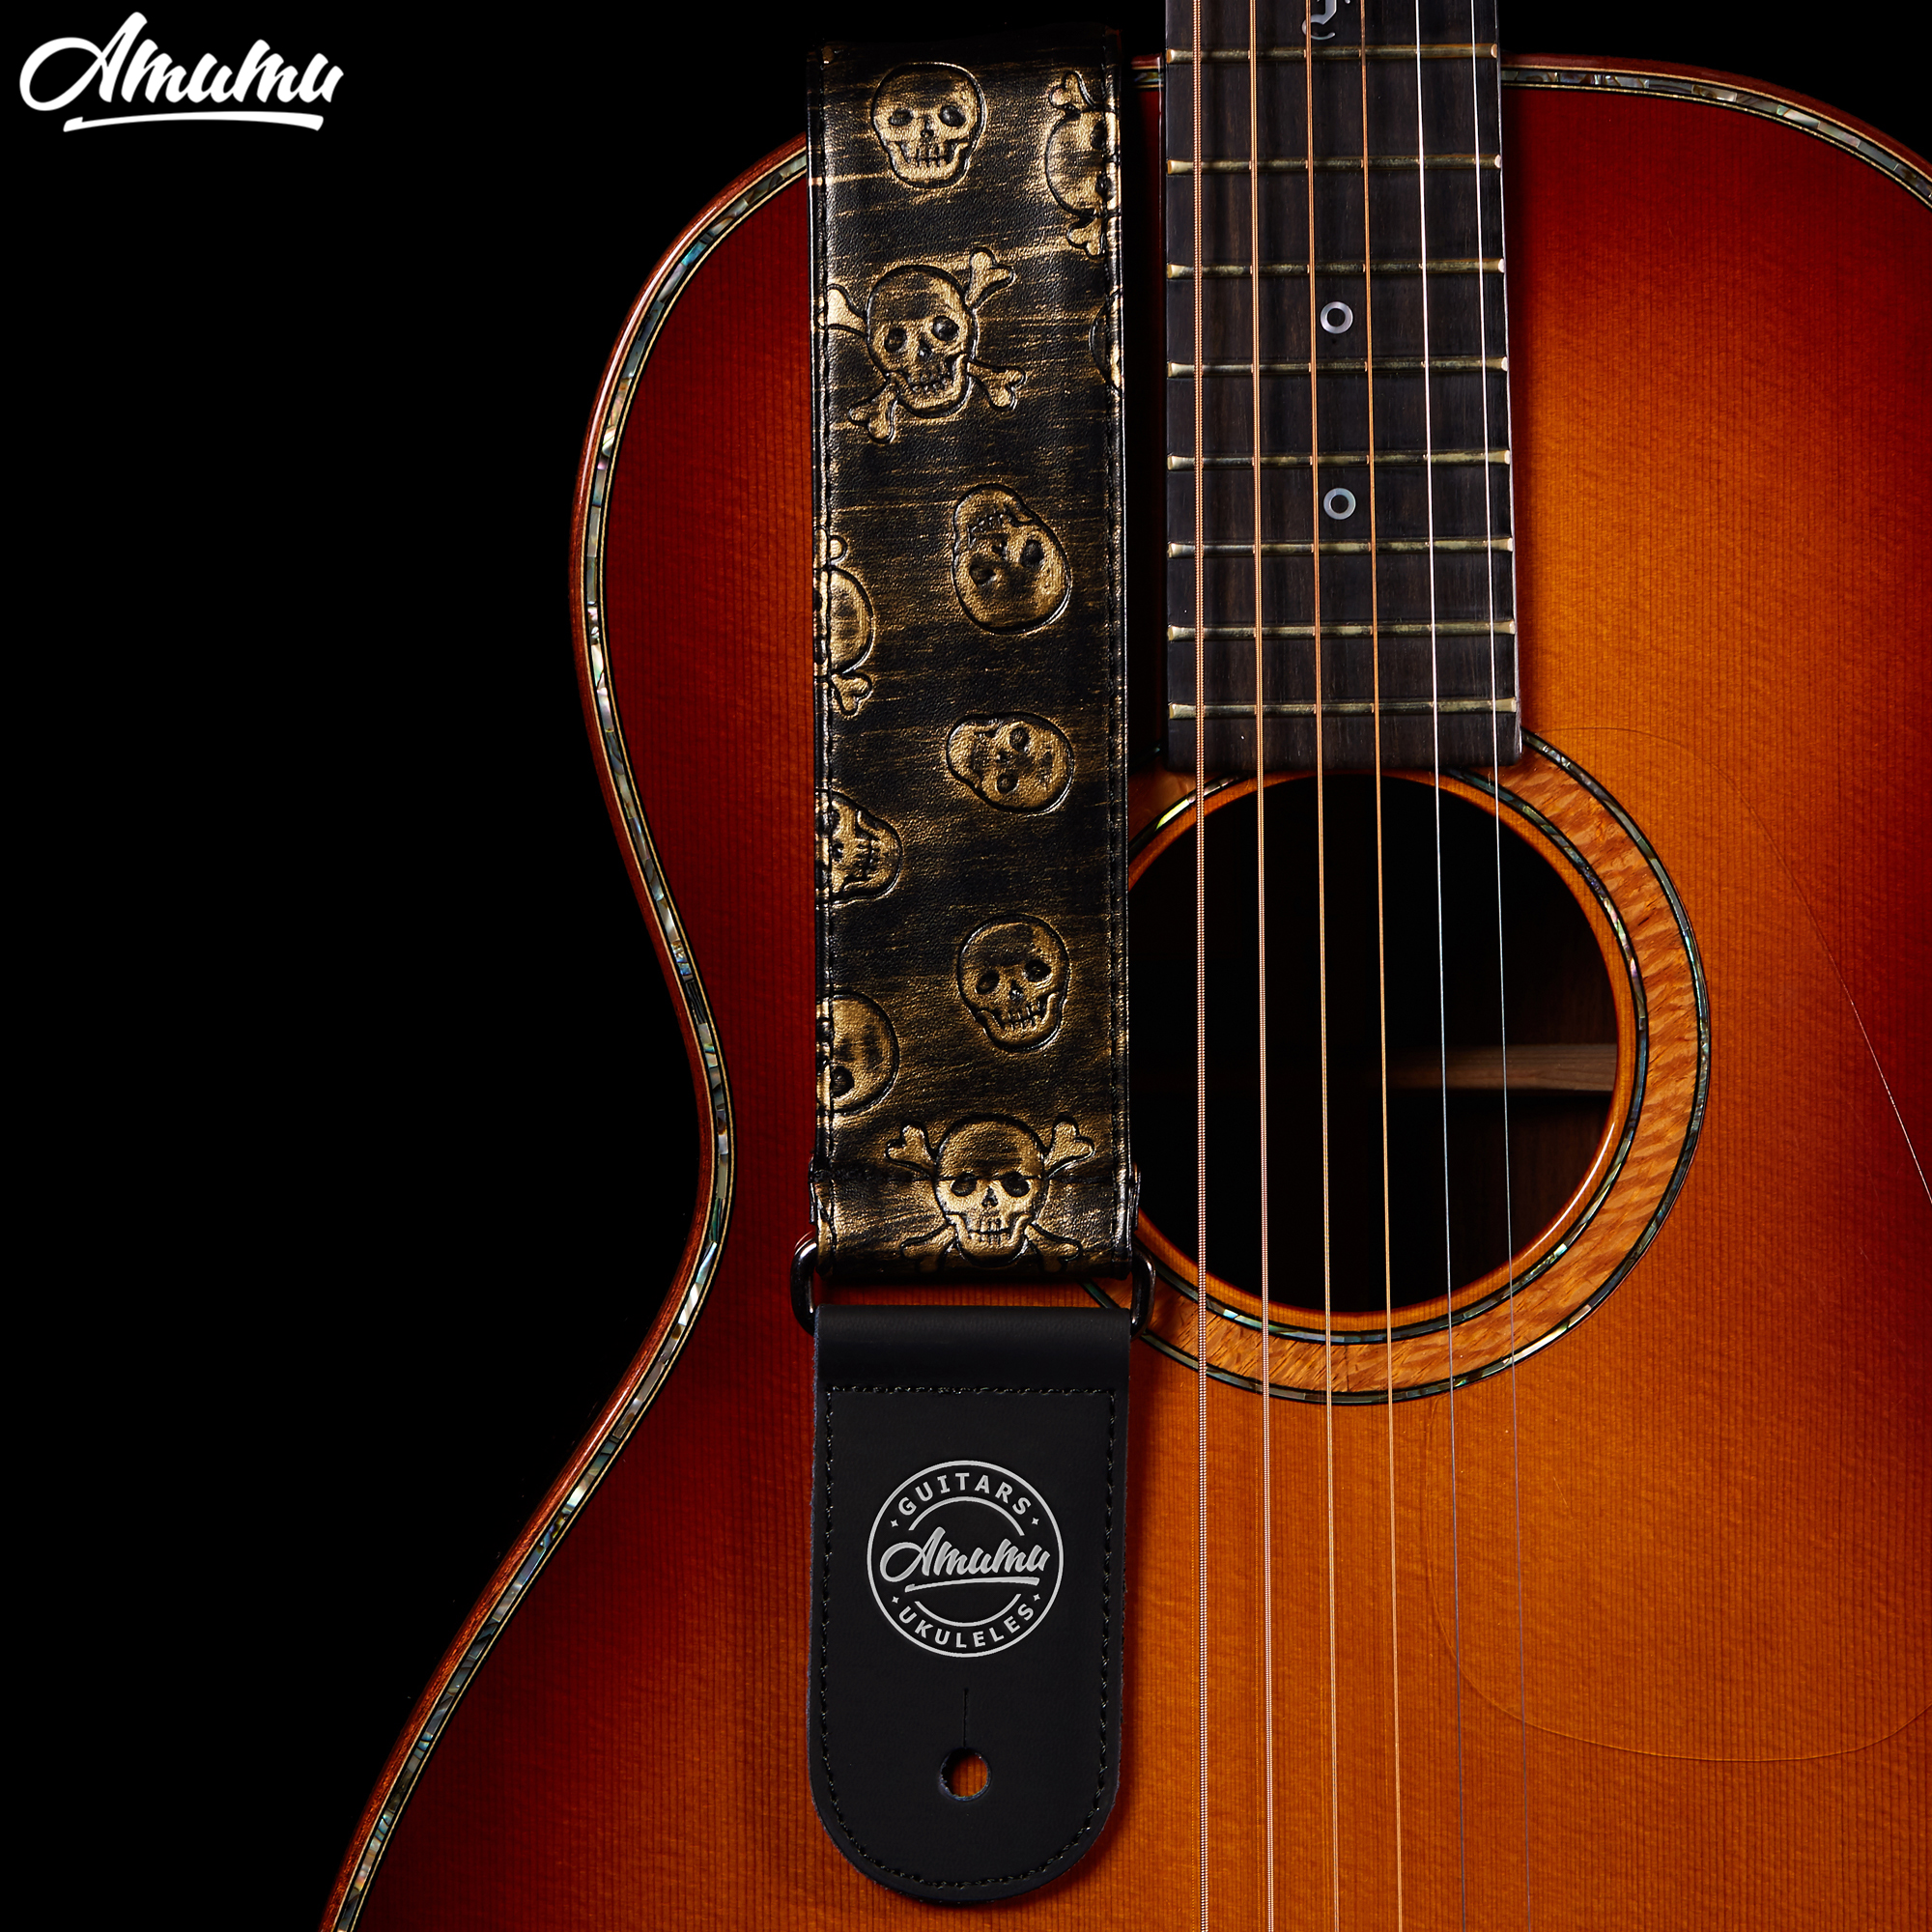 Amumu Bronze PU Leather Guitar Straps Emboss Skull Pattern 5cm Width for Folk Acoustic Electric Guitar 93-163cm Length S532-1